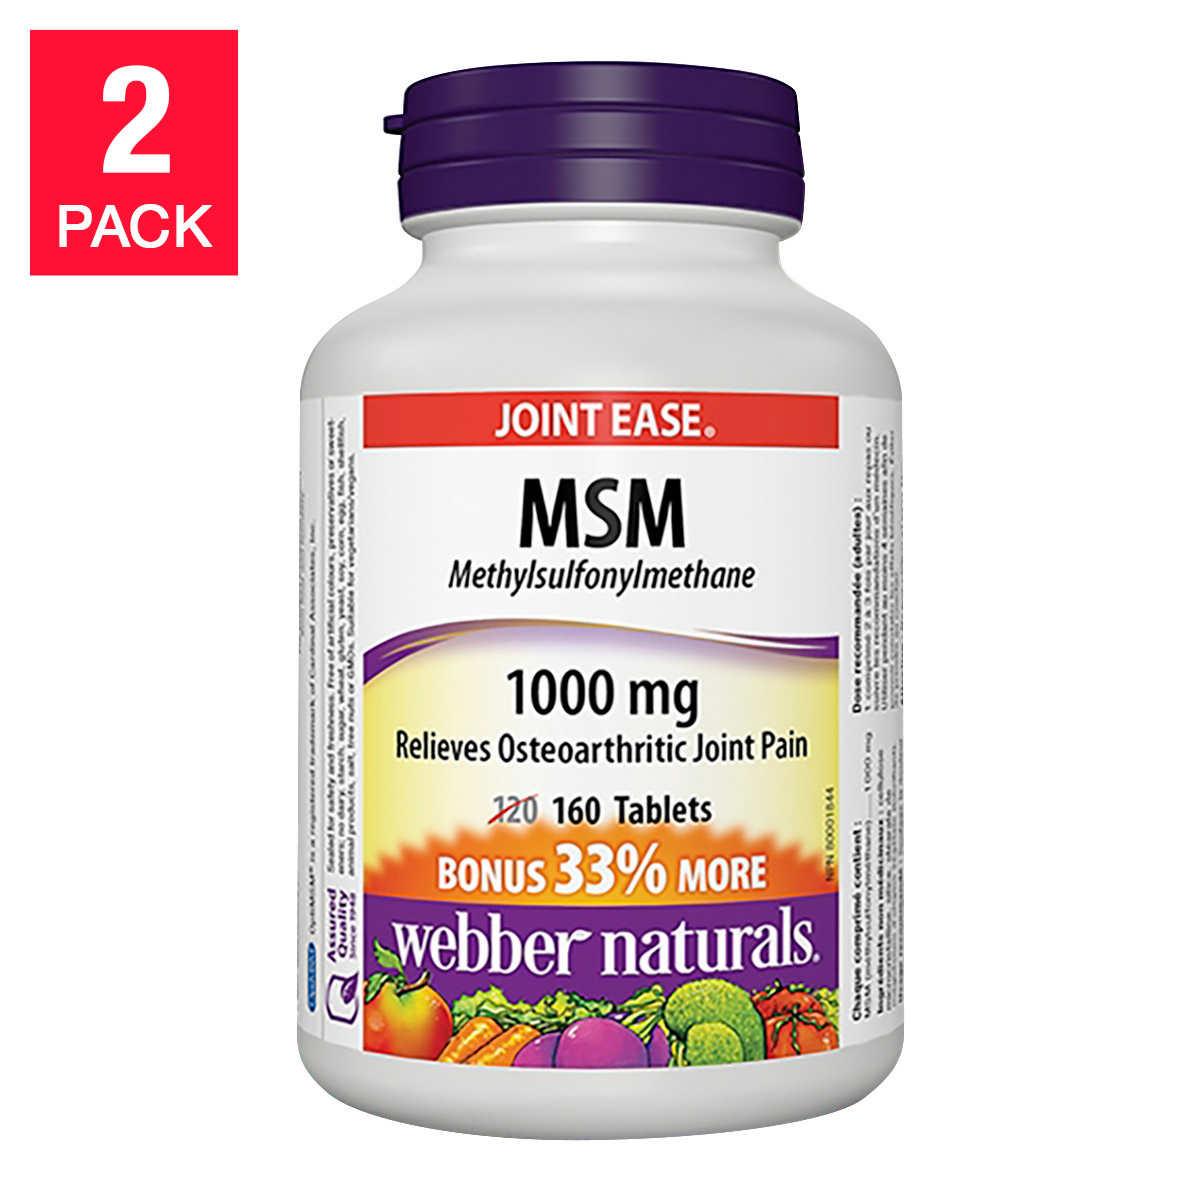 webber naturals® MSM 1000 mg -- 2 x 160 Tablets